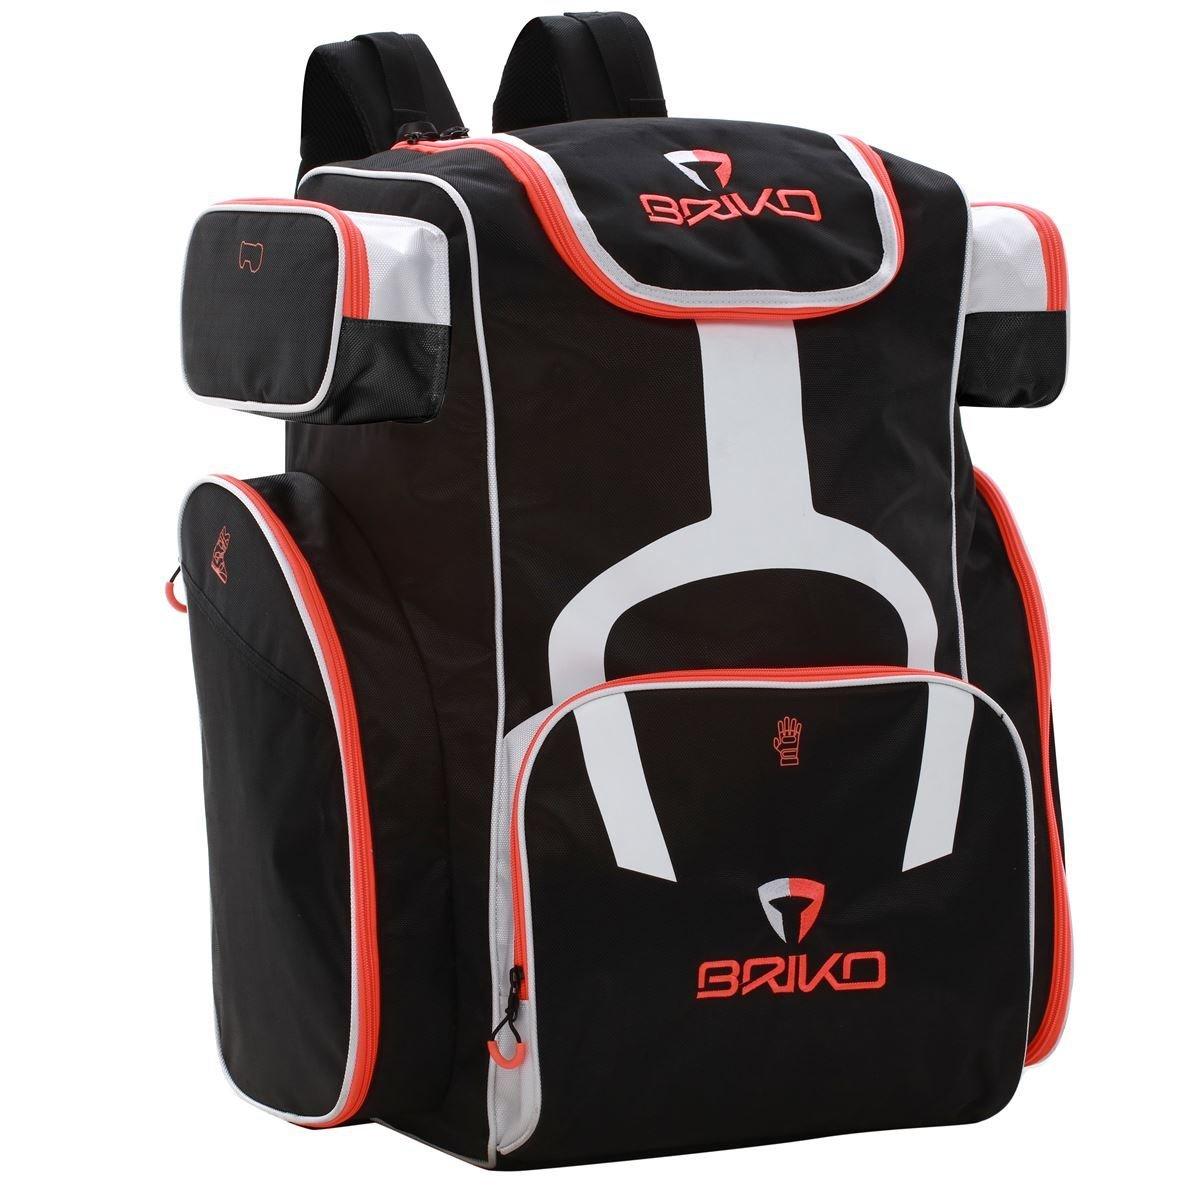 Briko Race Bag Black Orange